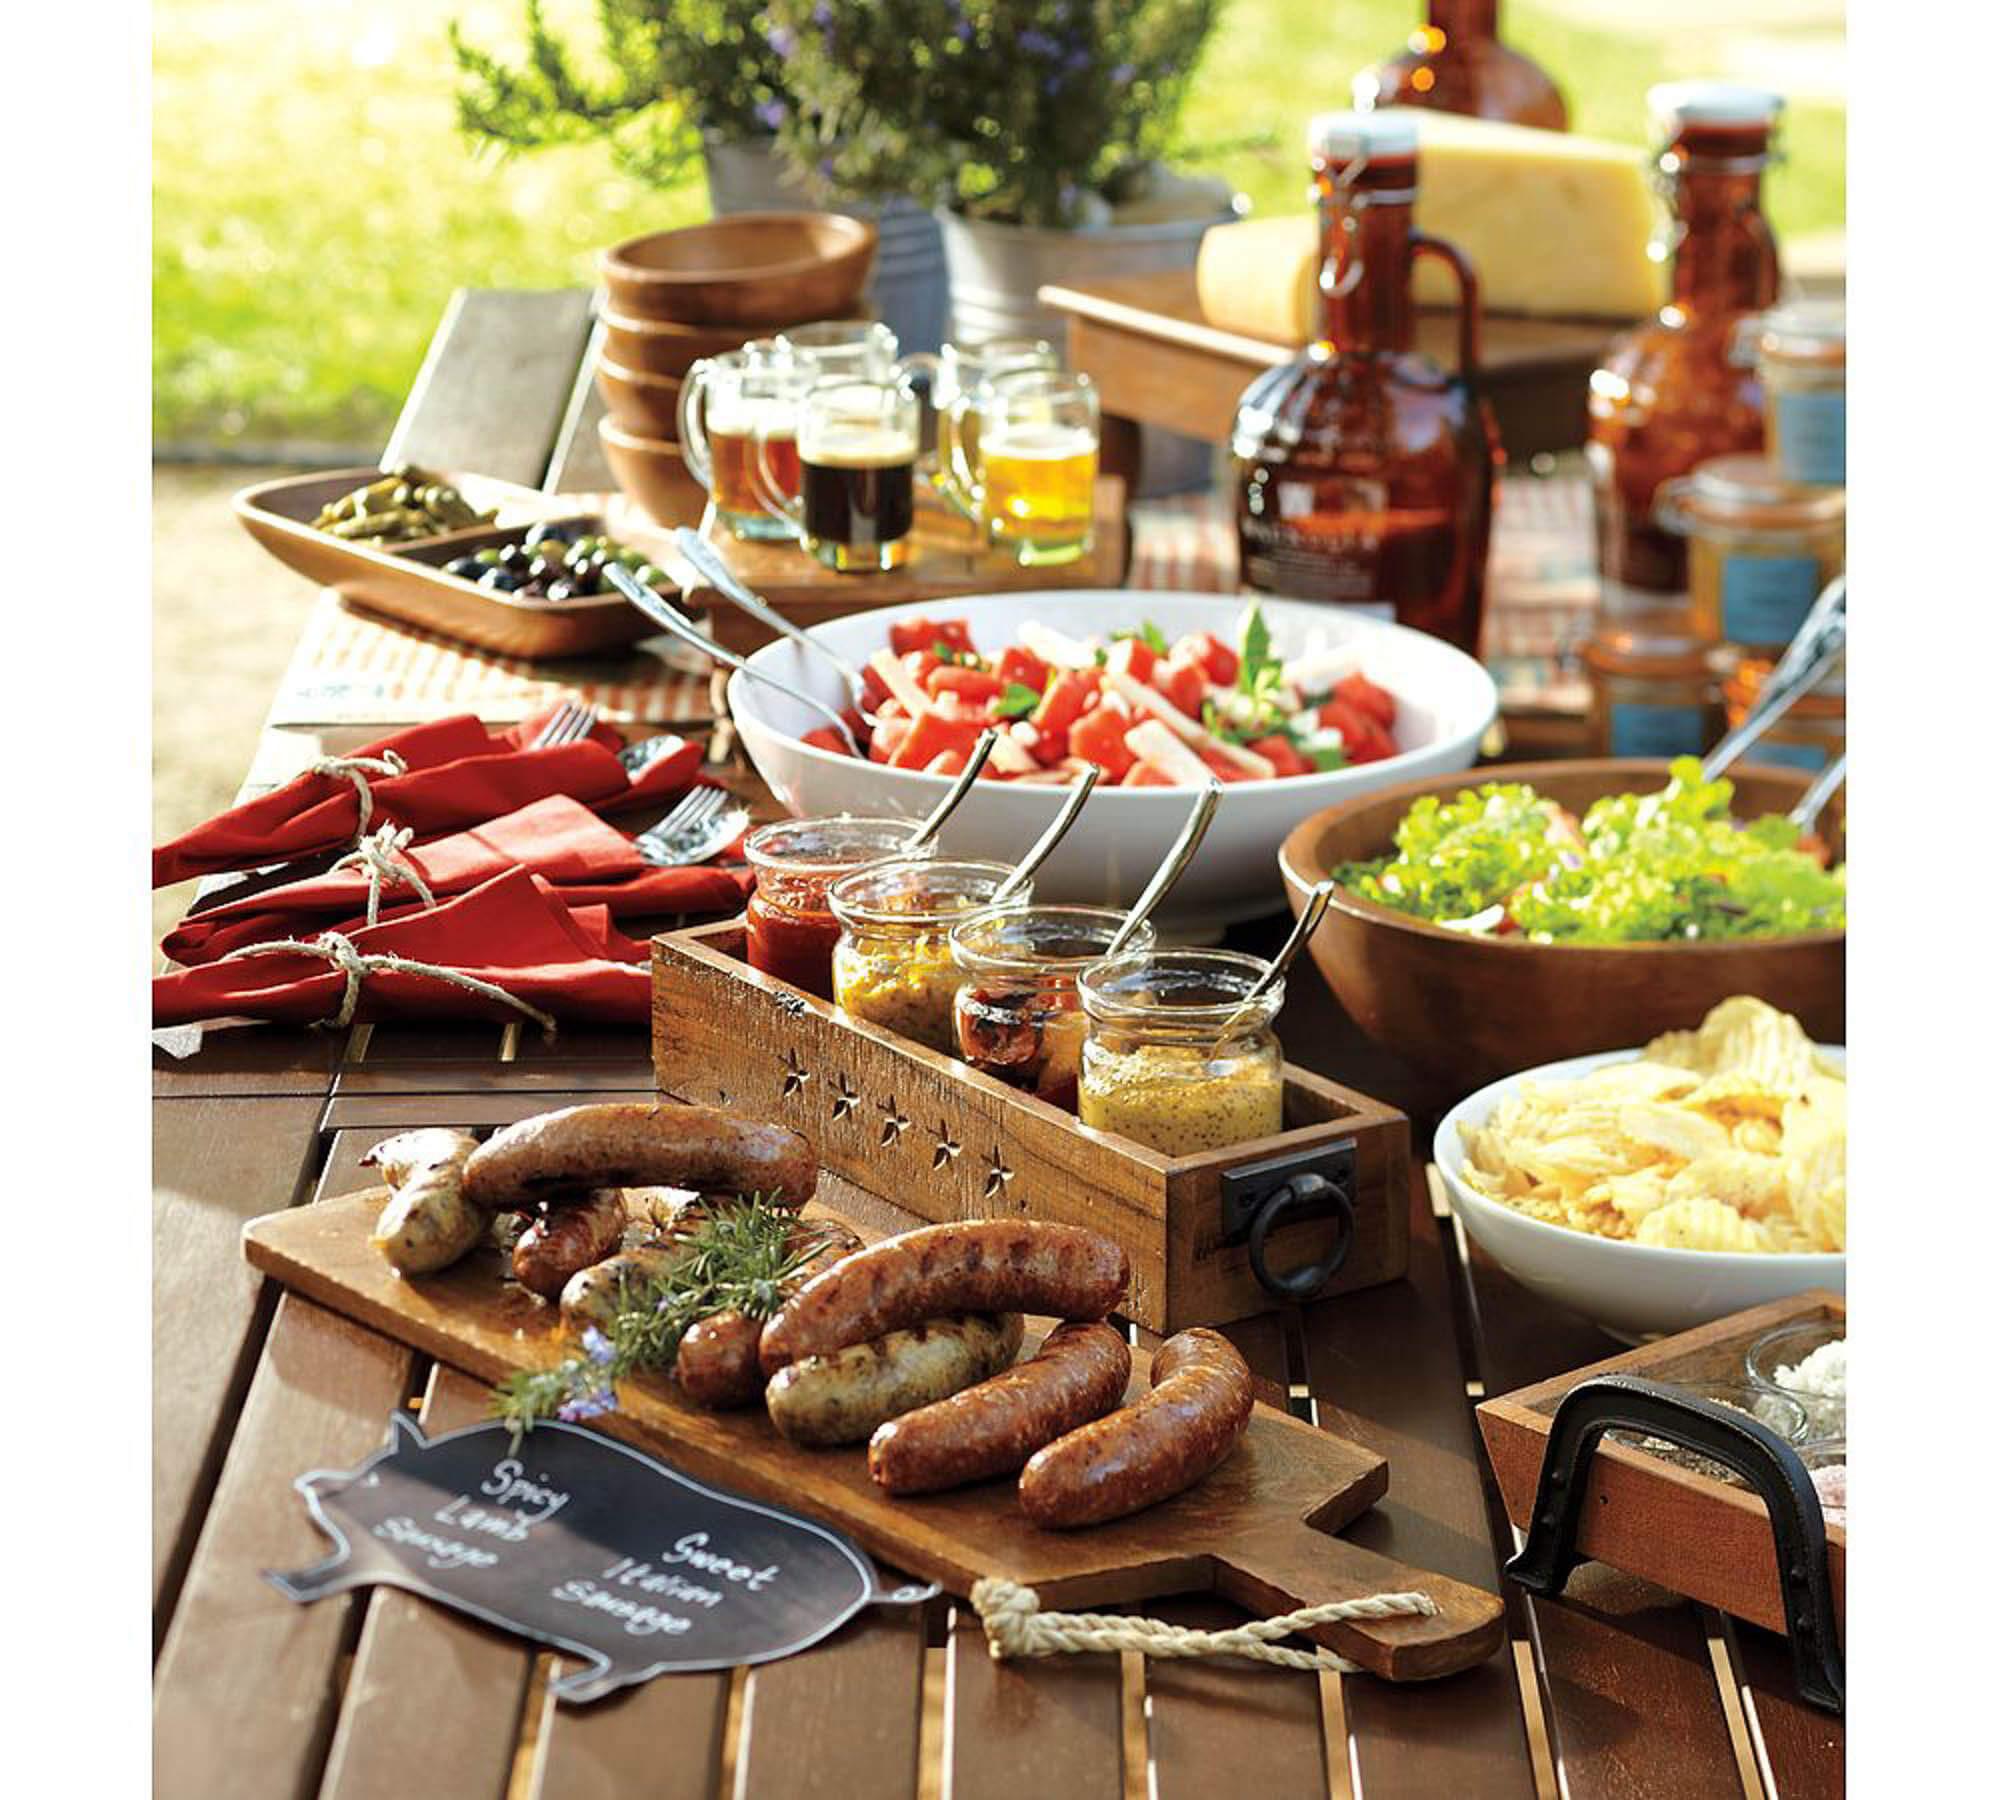 Backyard Party Menu Ideas  How to Host a Backyard Party & BBQ — Gentleman s Gazette